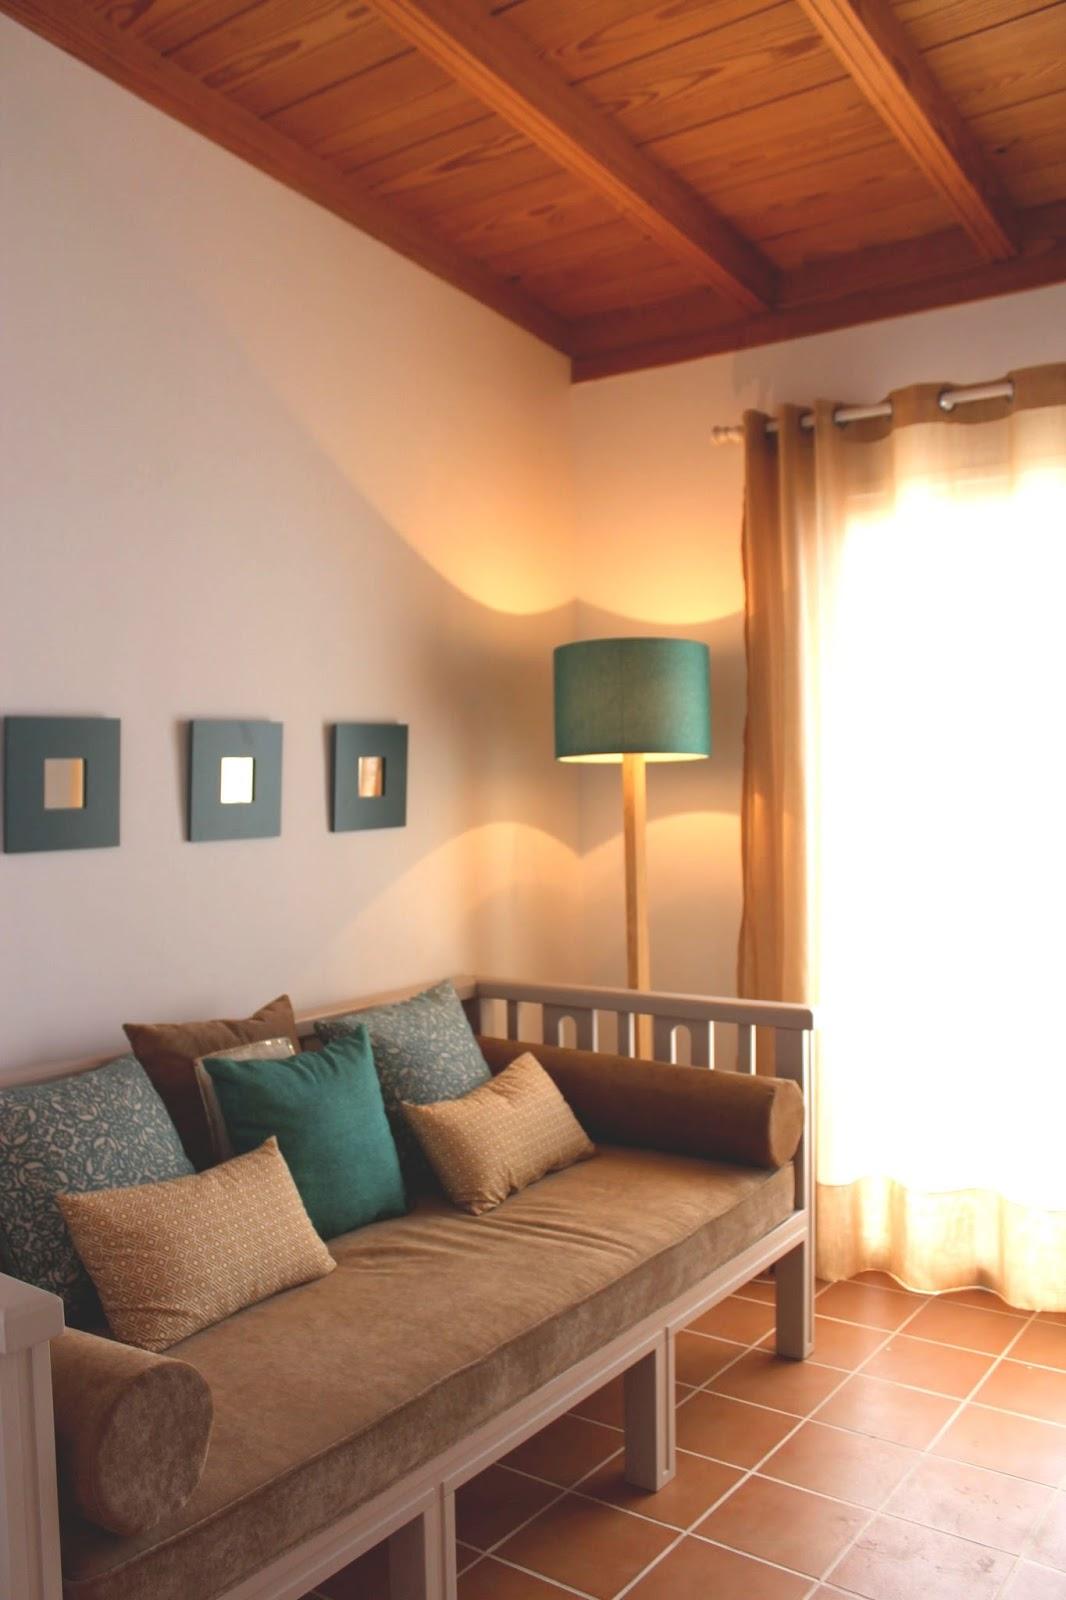 Tatiana doria decoraci n de viviendas habitaci n estudio for Decoracion de viviendas